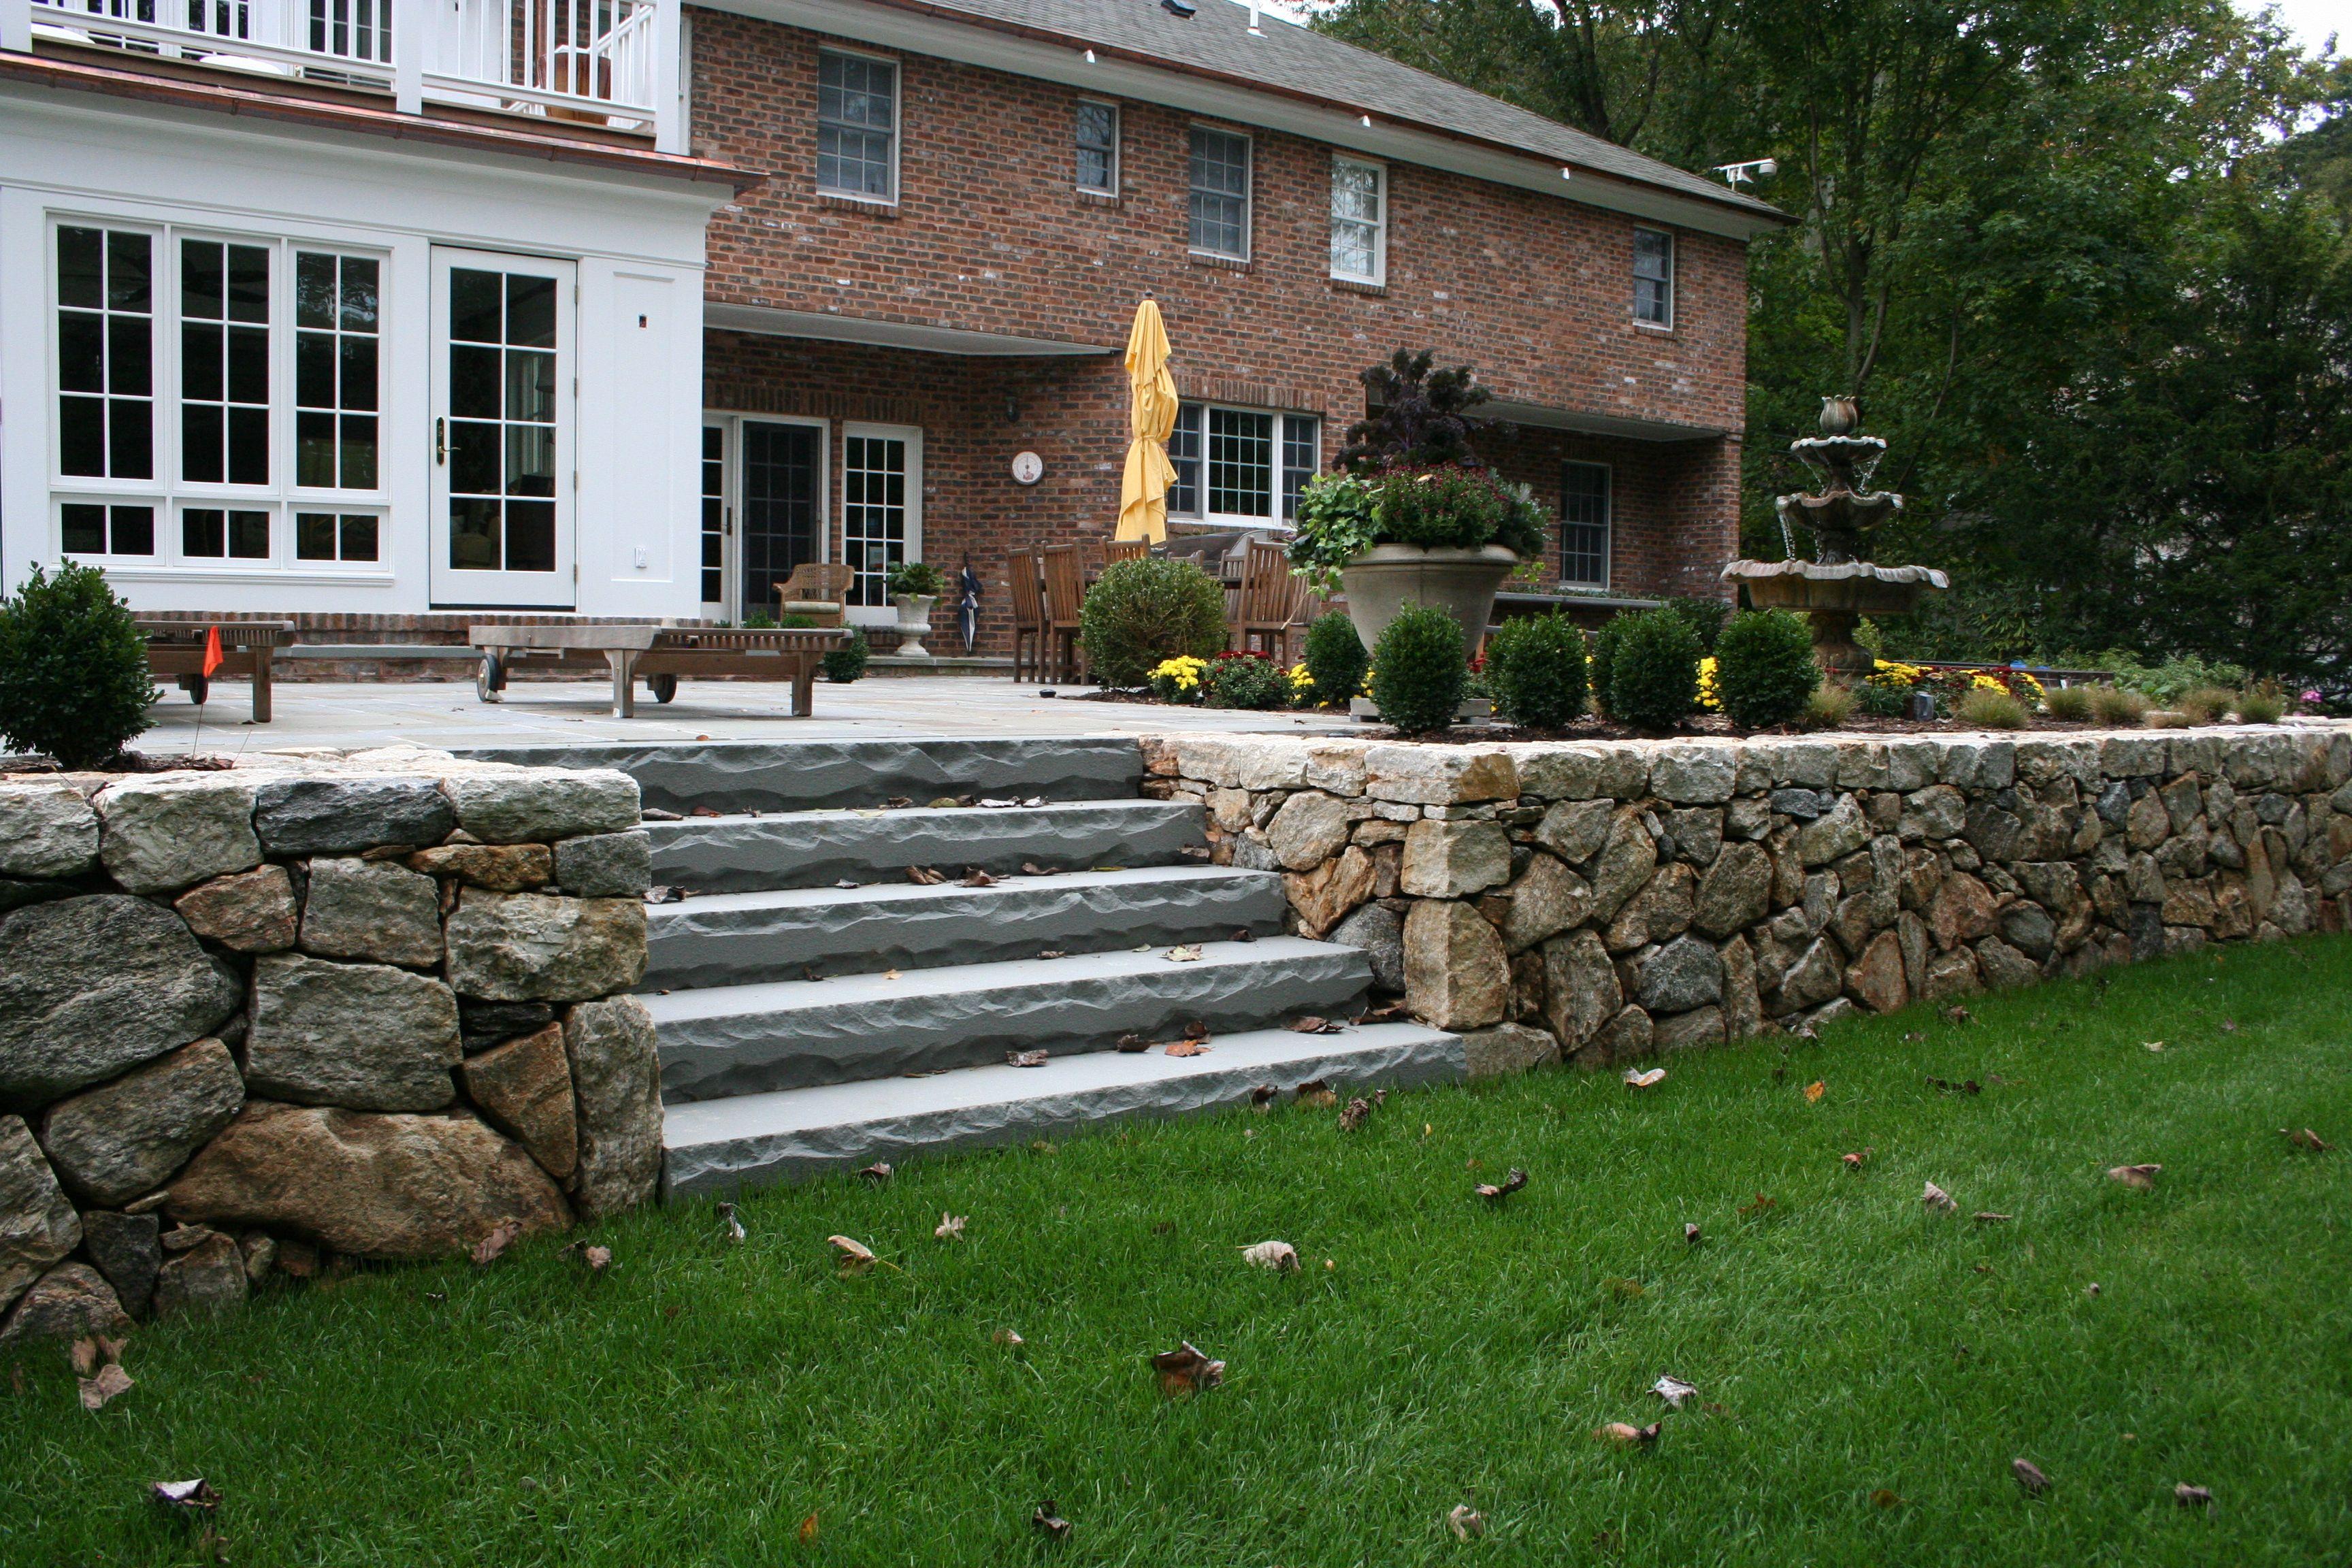 karney stone wall with bluestone steps set in lawn